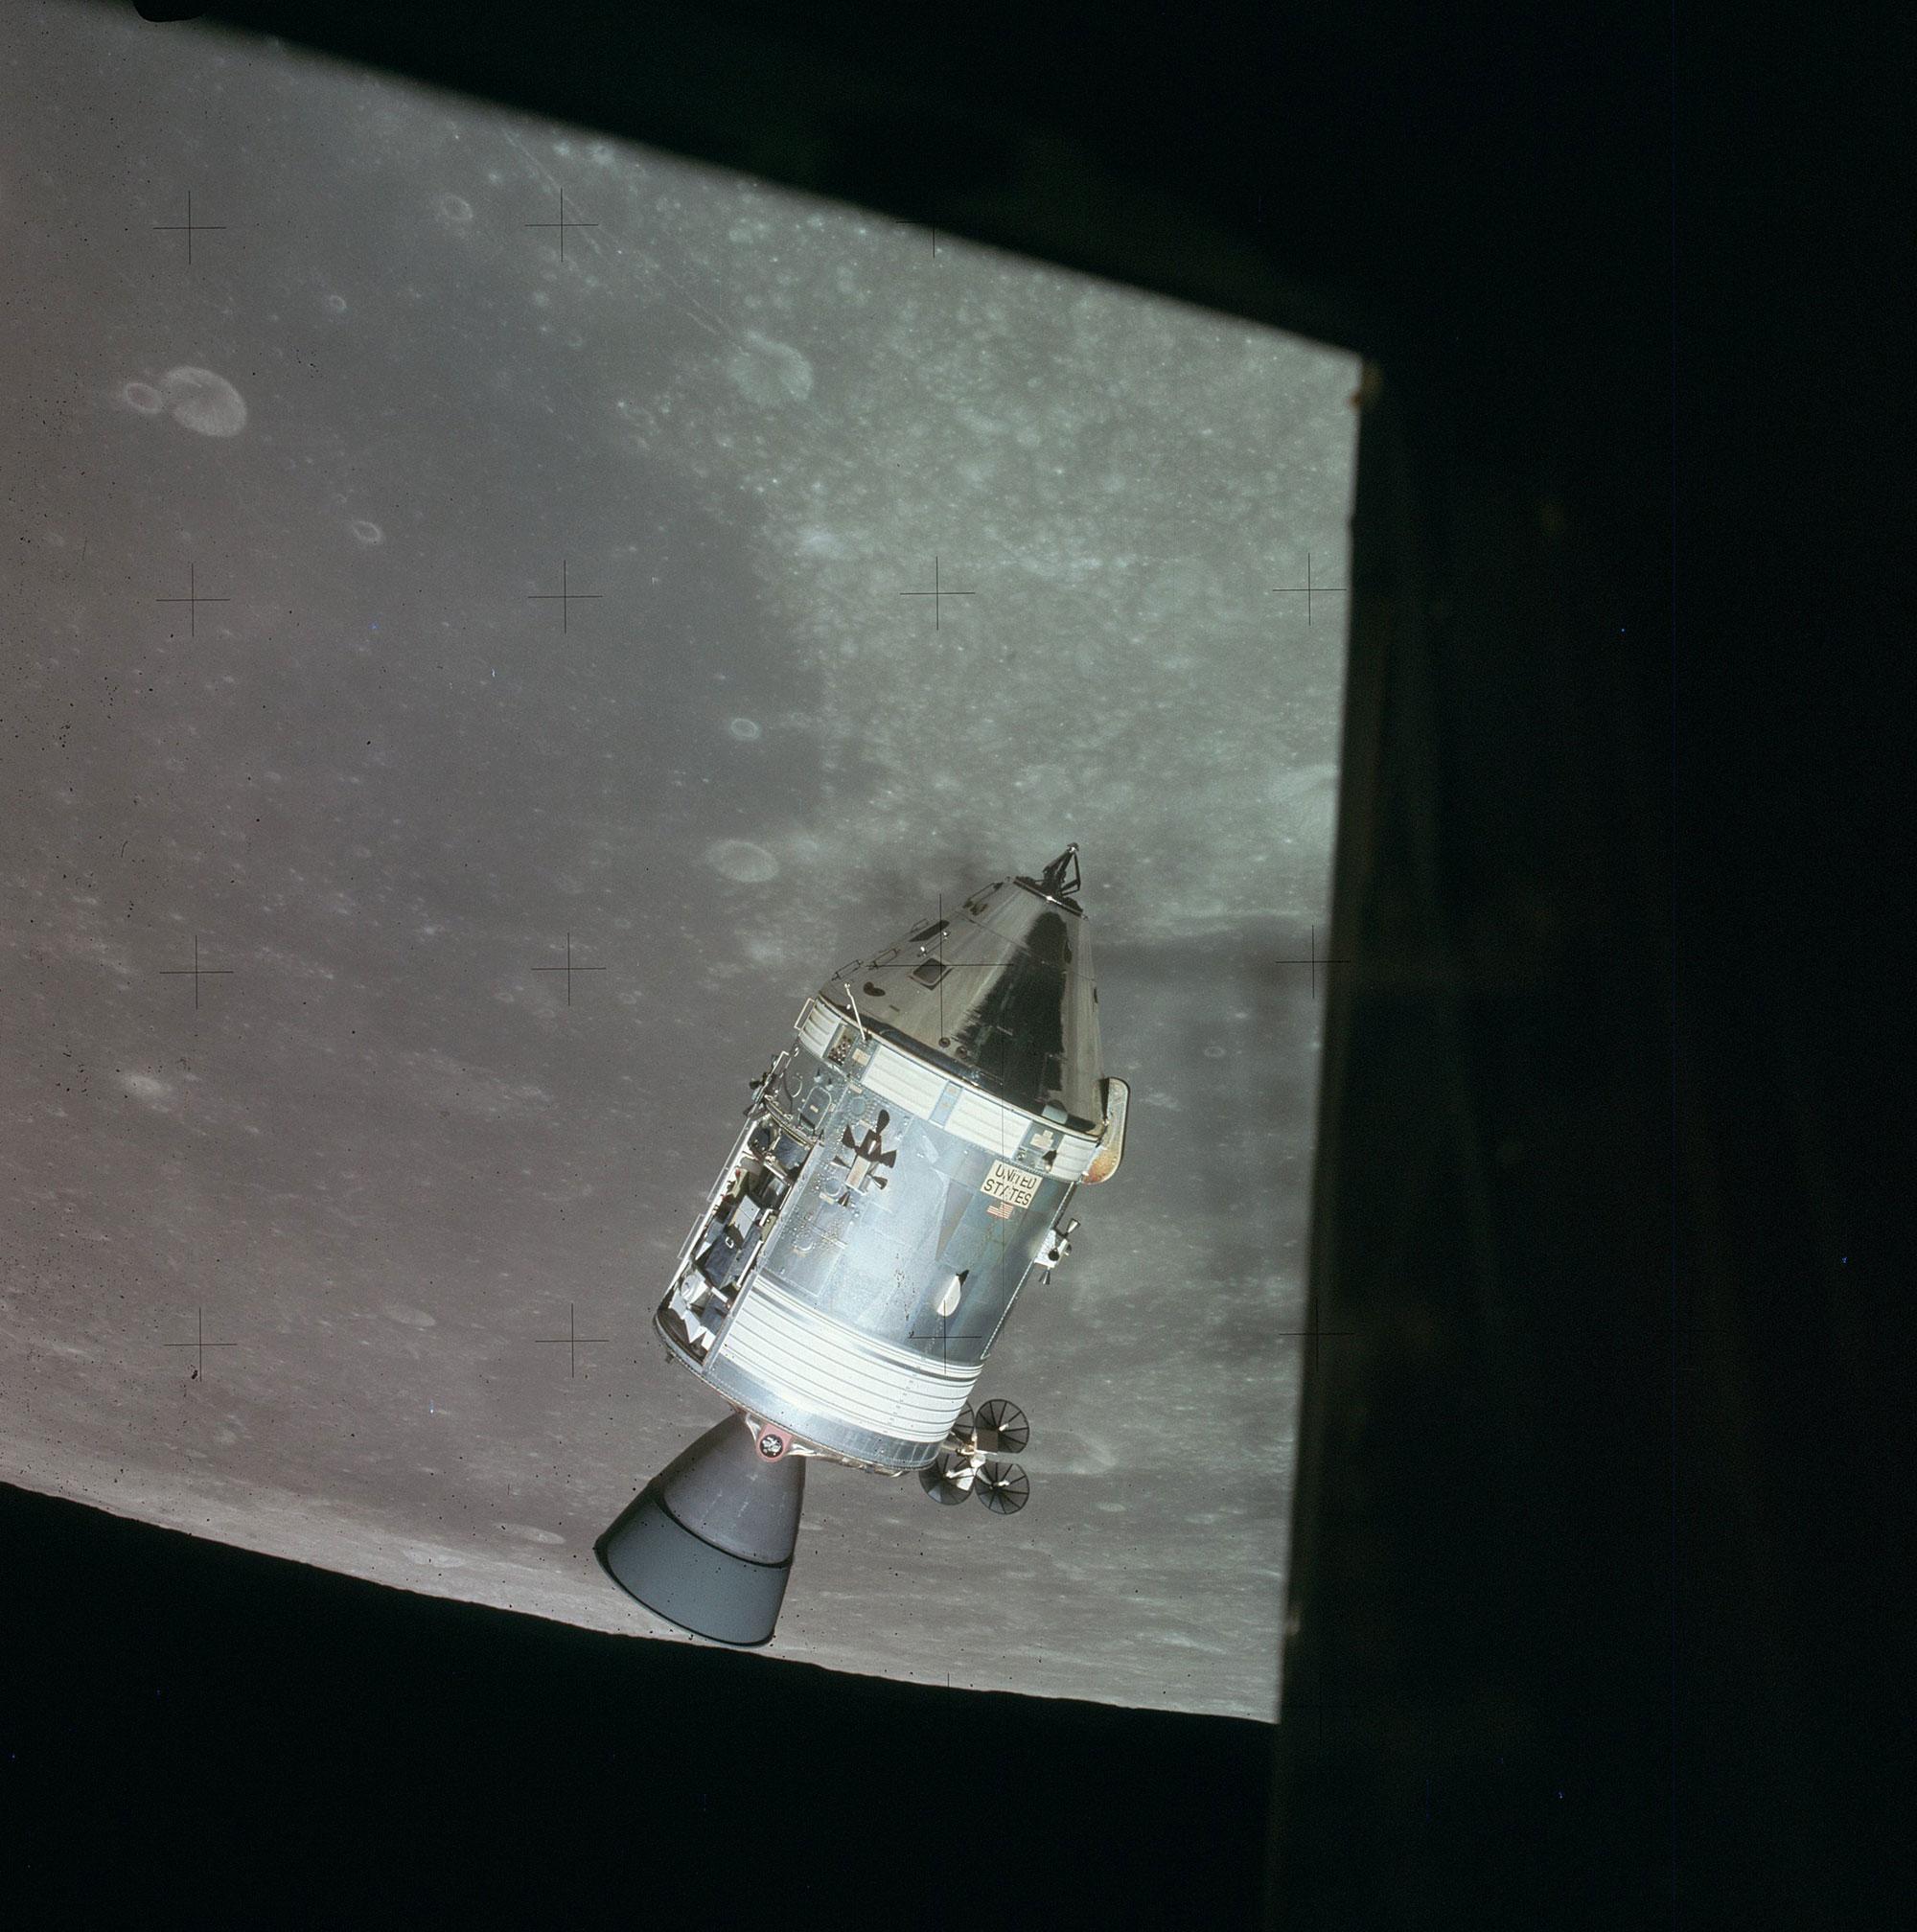 apollo 15 spacecraft instruments - photo #11